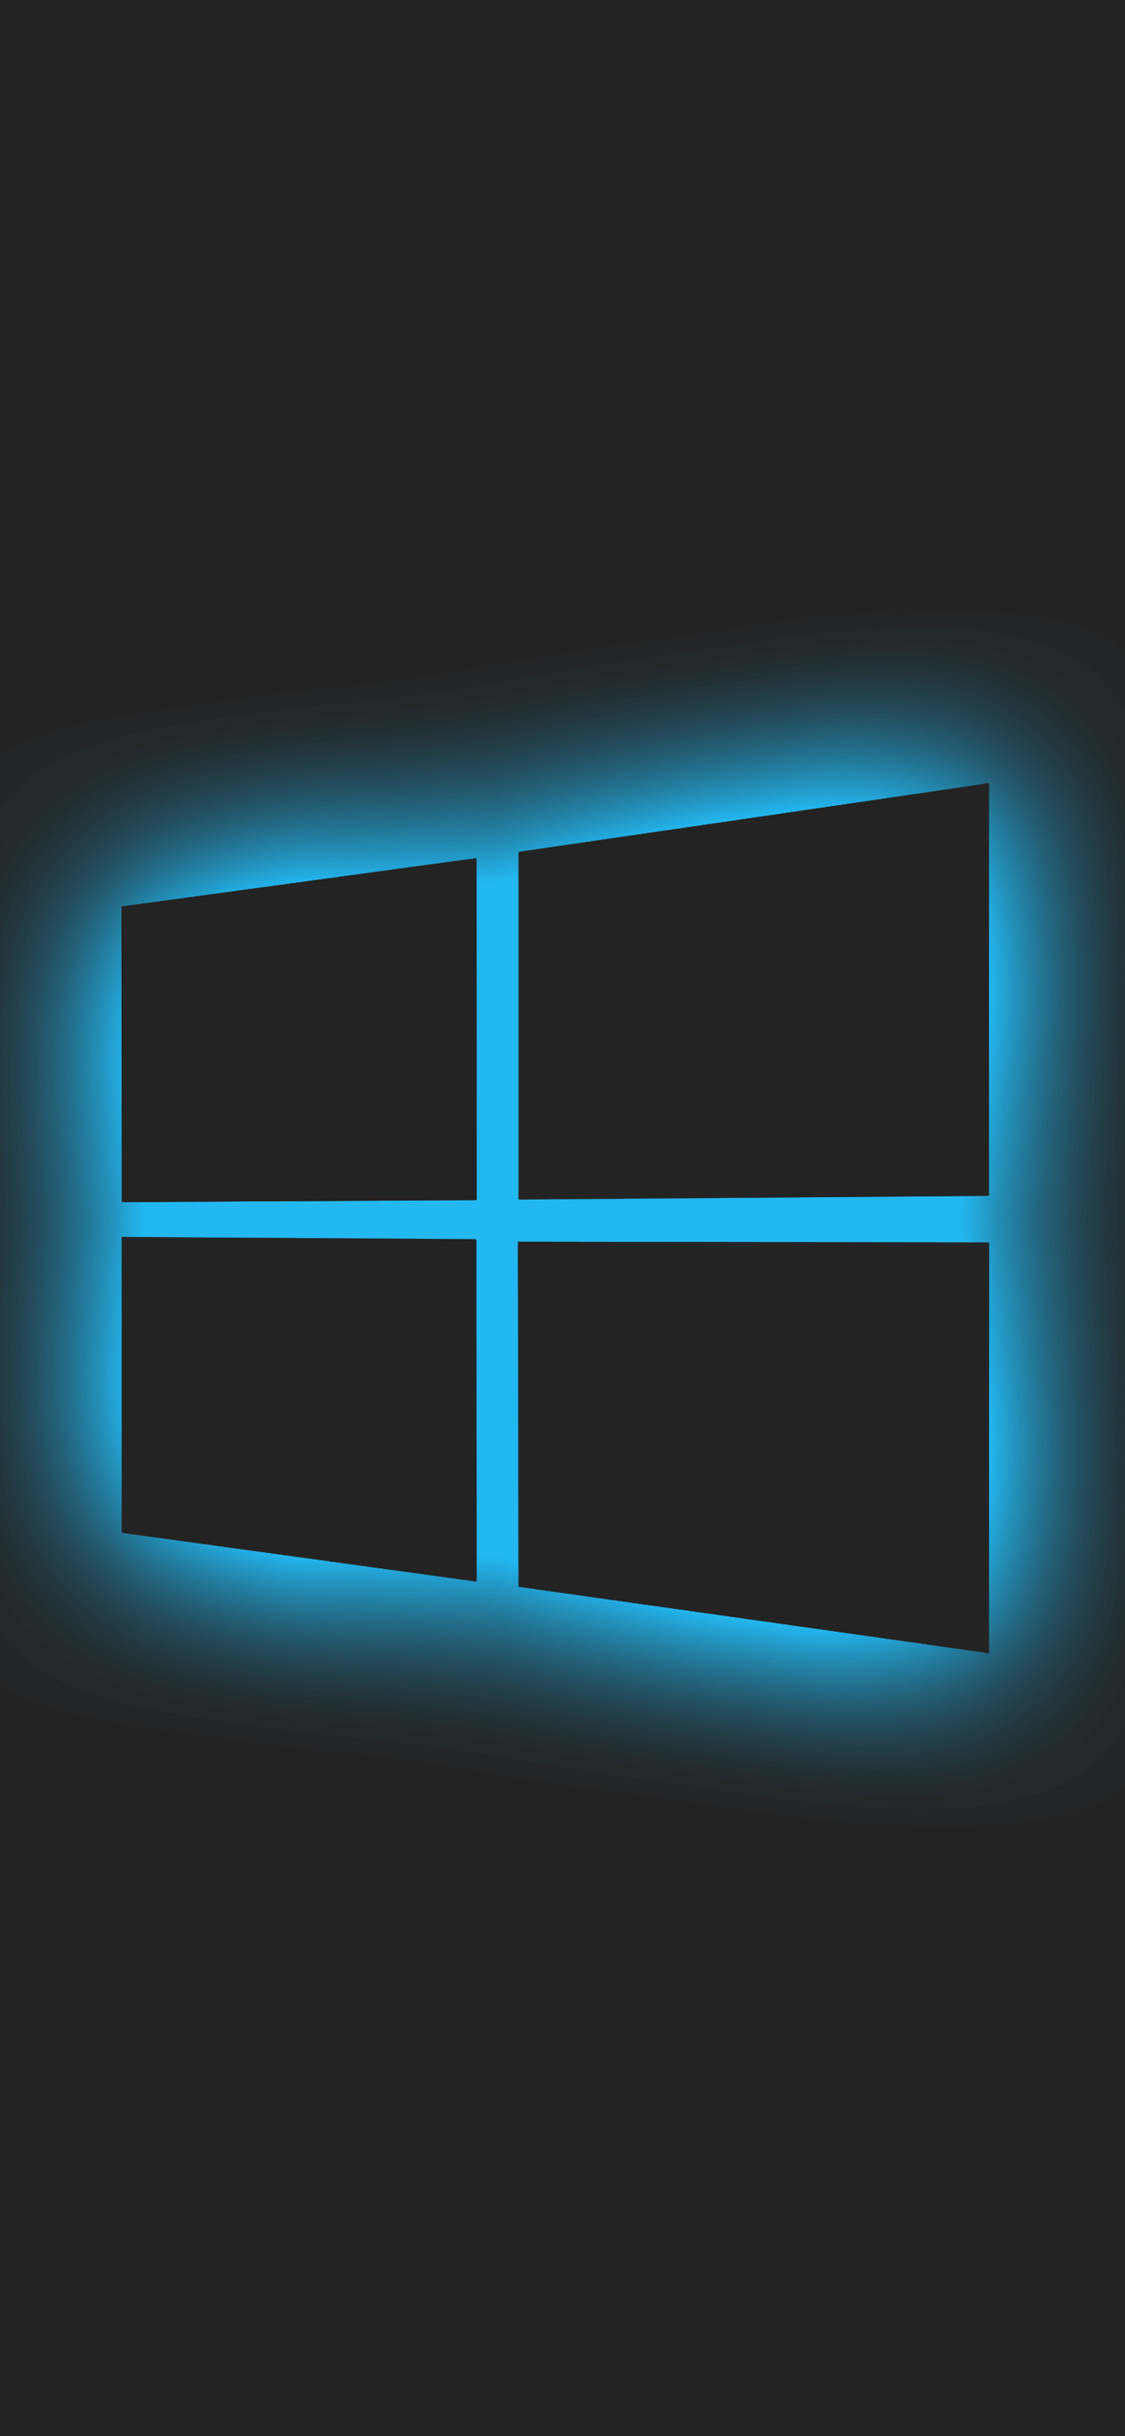 windows-glowing-logo-blue-5k-id.jpg